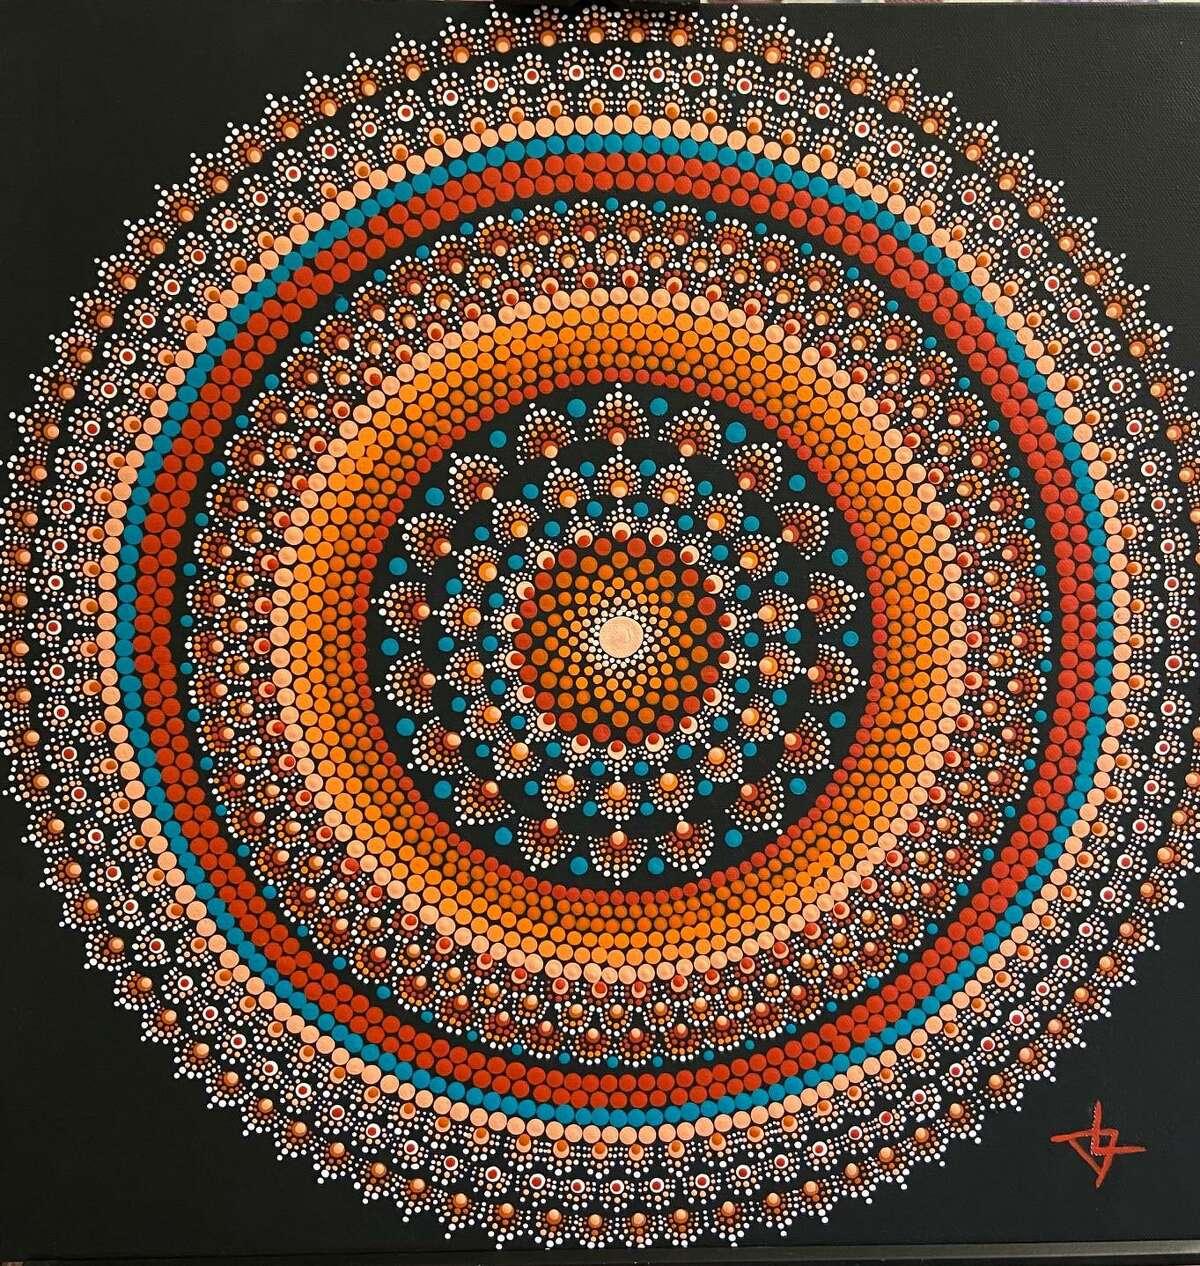 The Summer Arts Festival on the Essex Town Green will be held June 19-20. Pictured, Orange & Teal Fibonacci & Circles Mandala, acrylic, By Deborah Churchill.